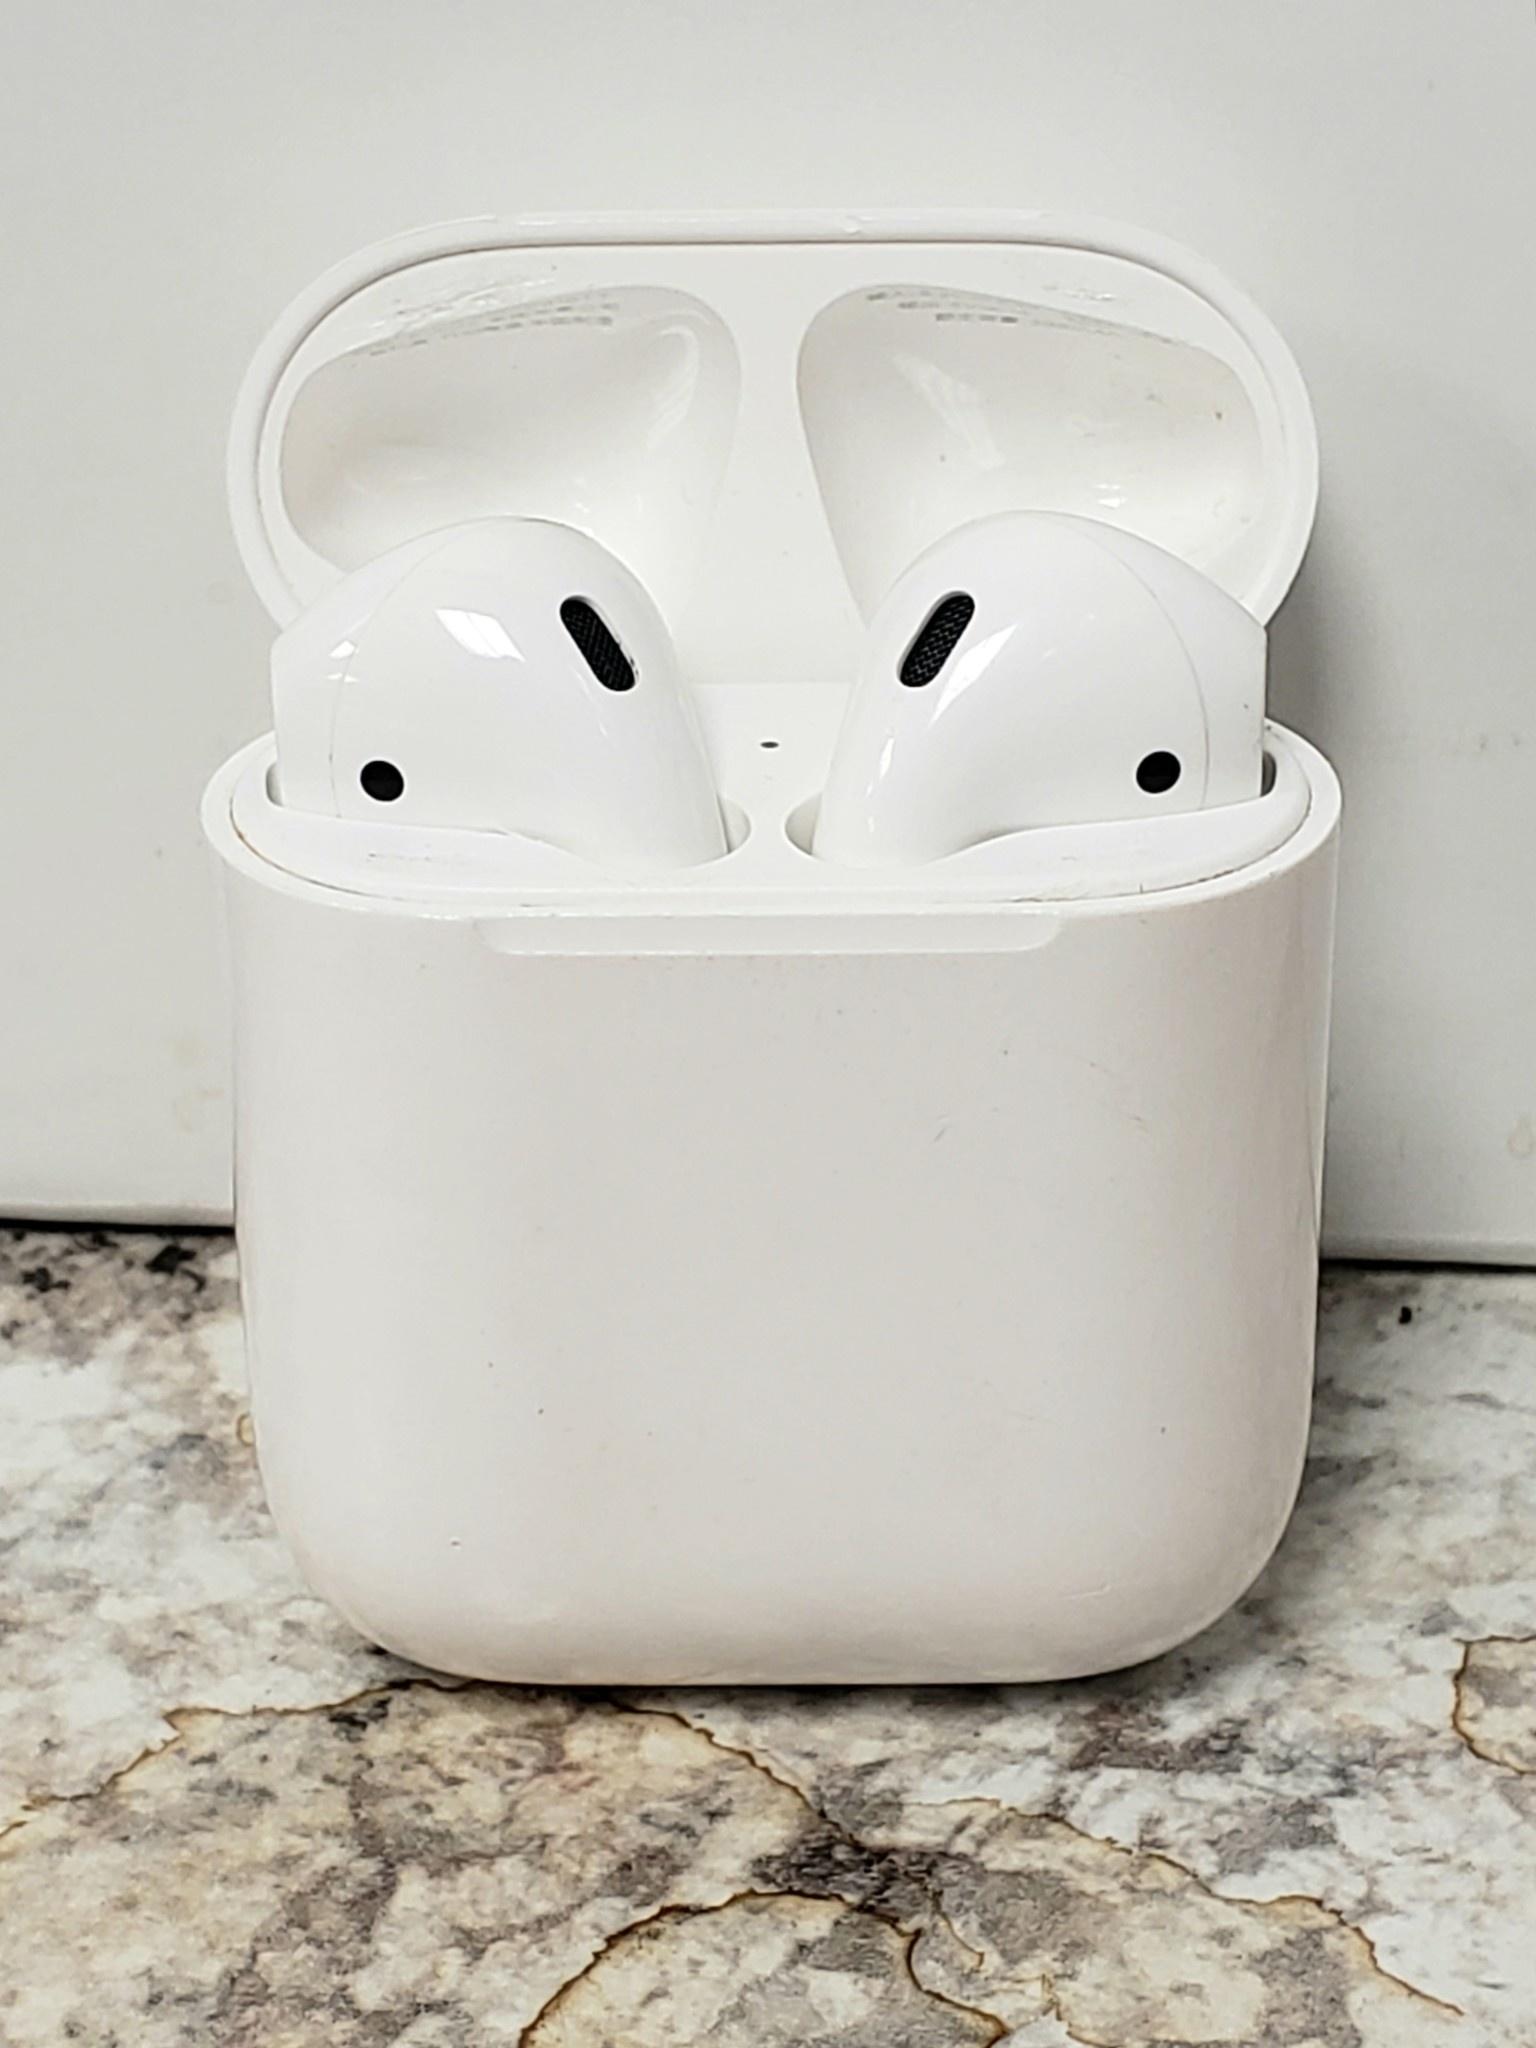 Apple Airpods 2 w/ Original Charging Case - Fair Condition